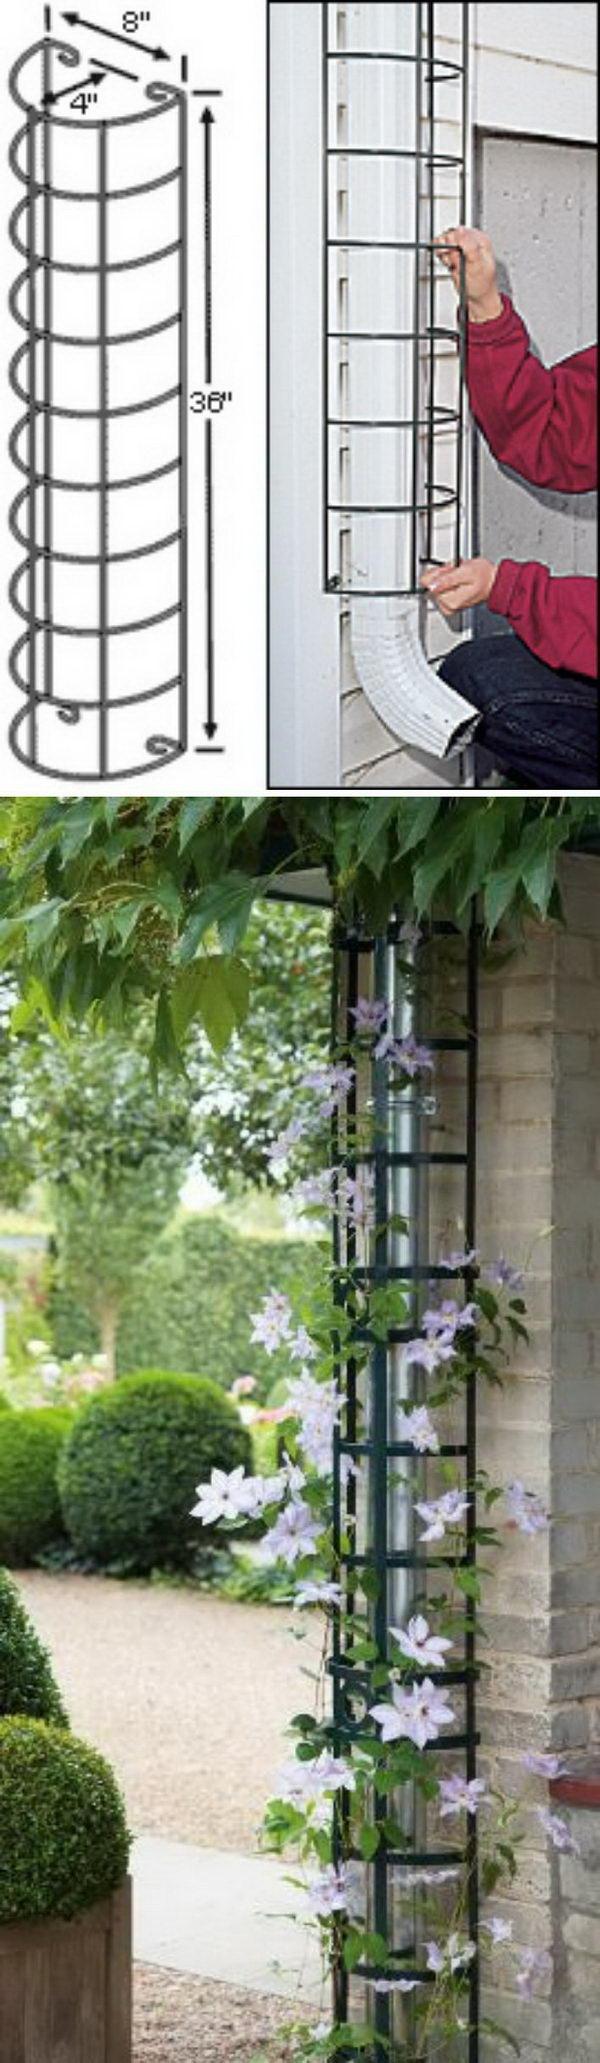 30 diy trellis ideas for your garden 2017 hide the downspout with a trellis solutioingenieria Images